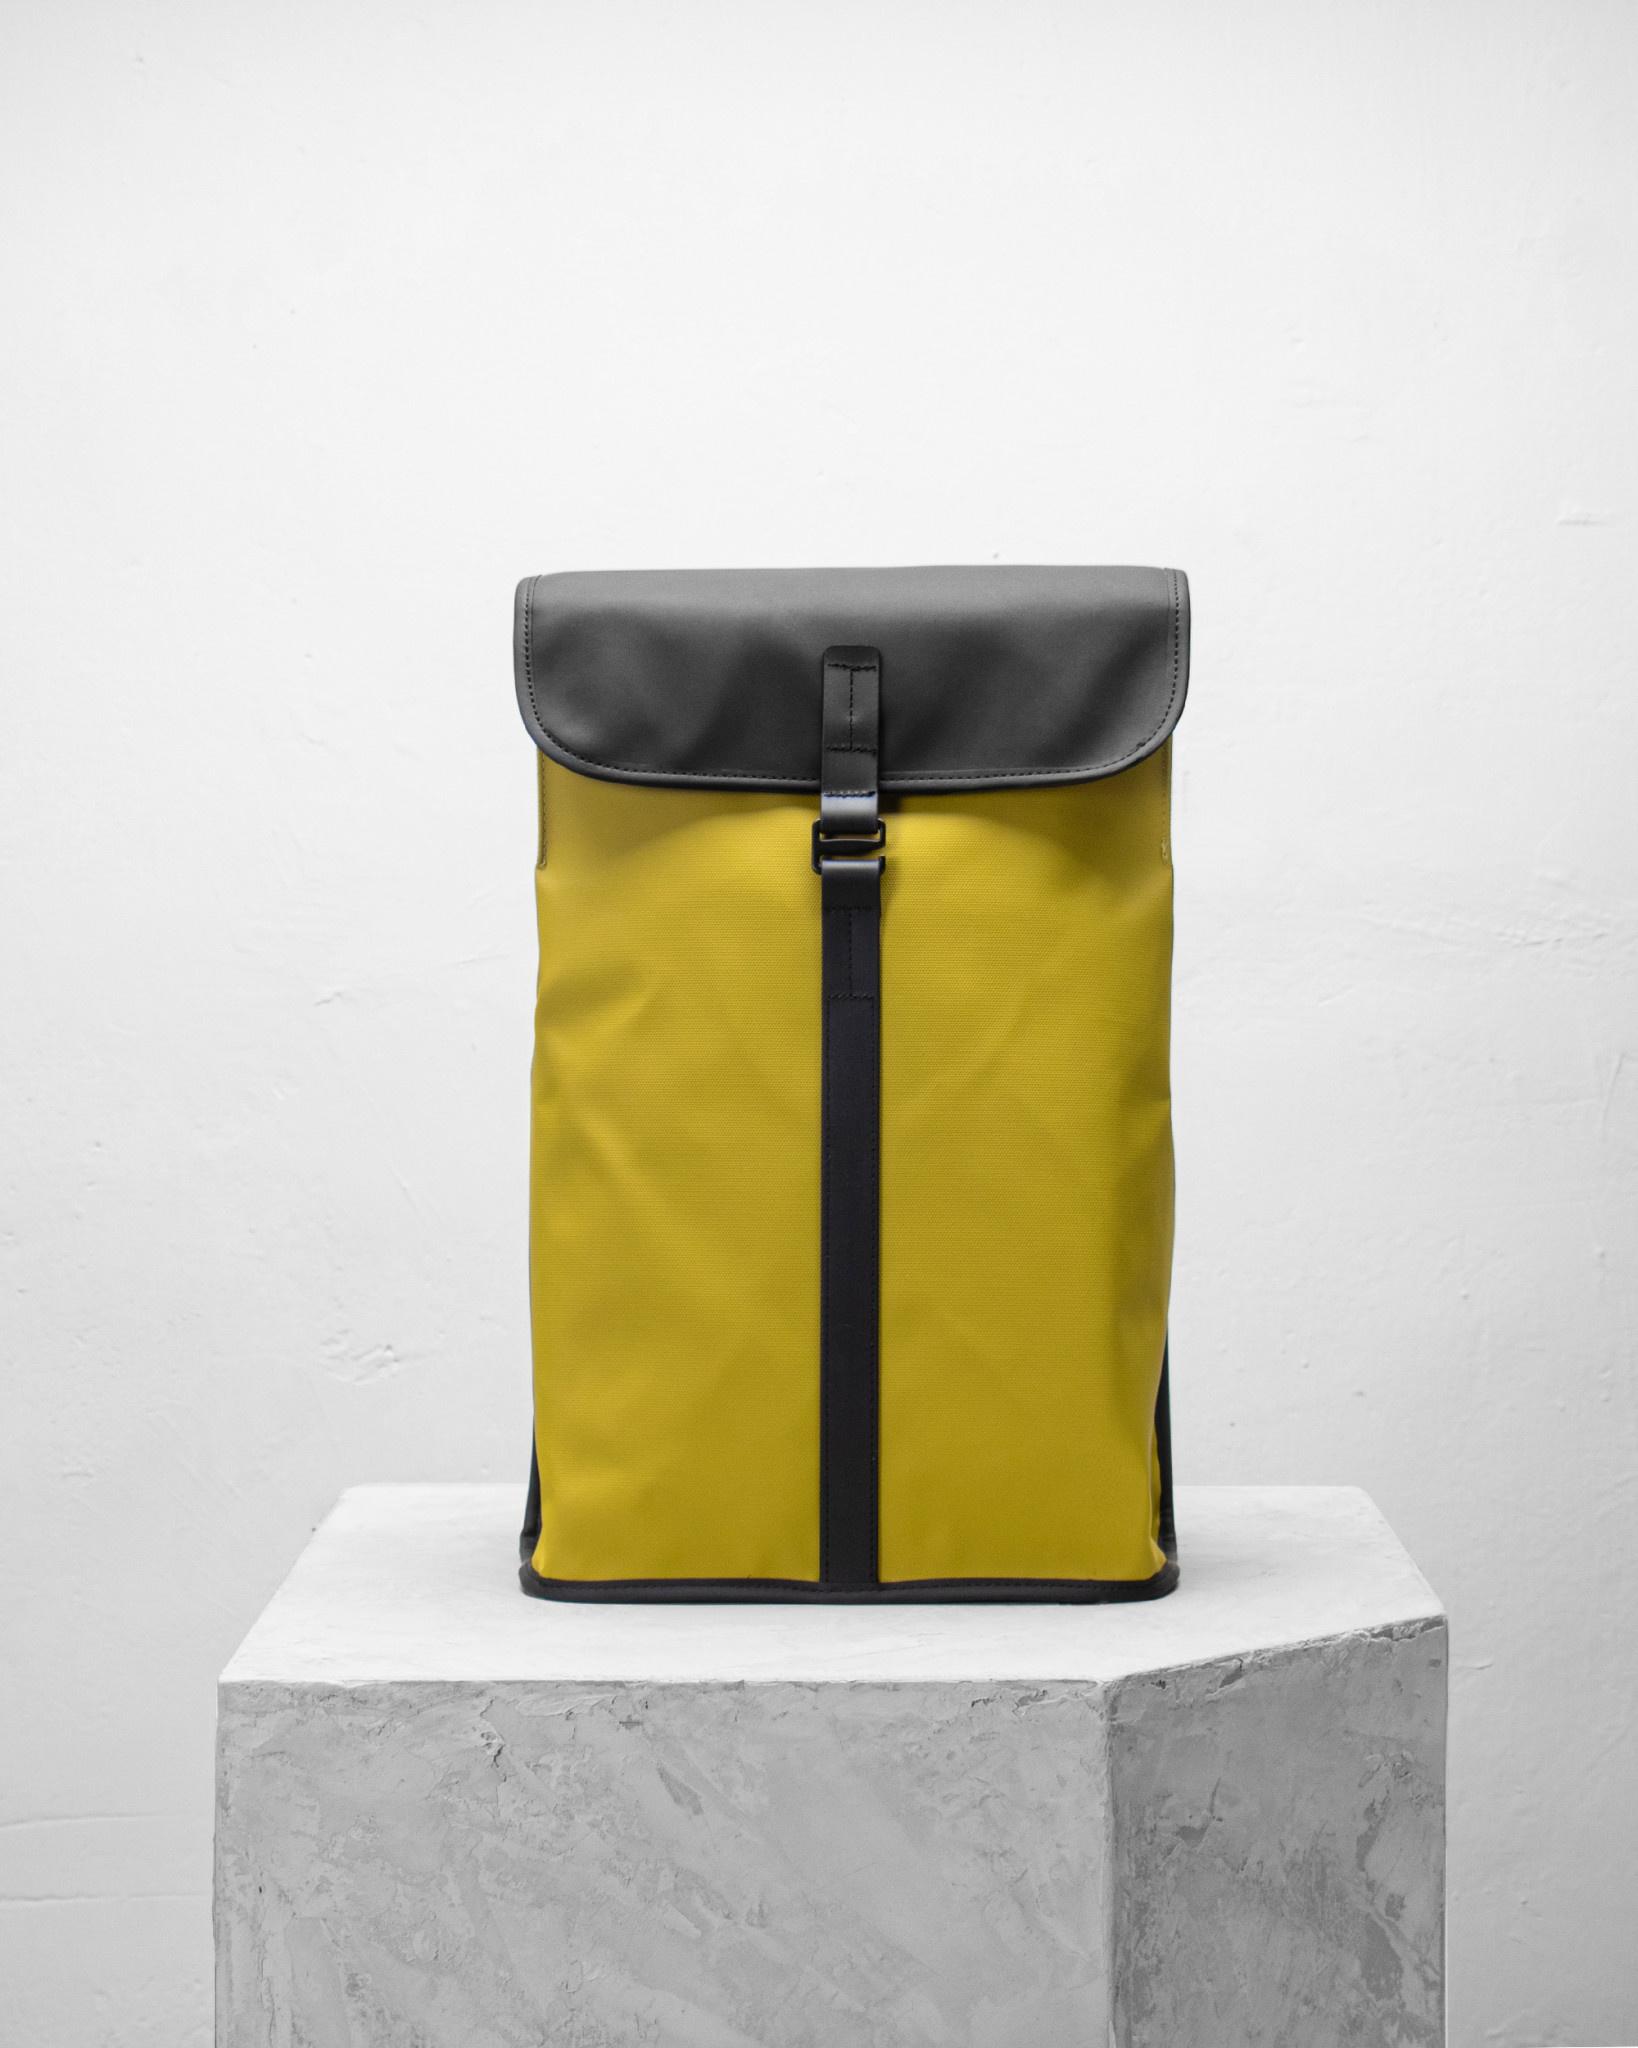 Topologie Topologie Satchel Backpack - Sulfur